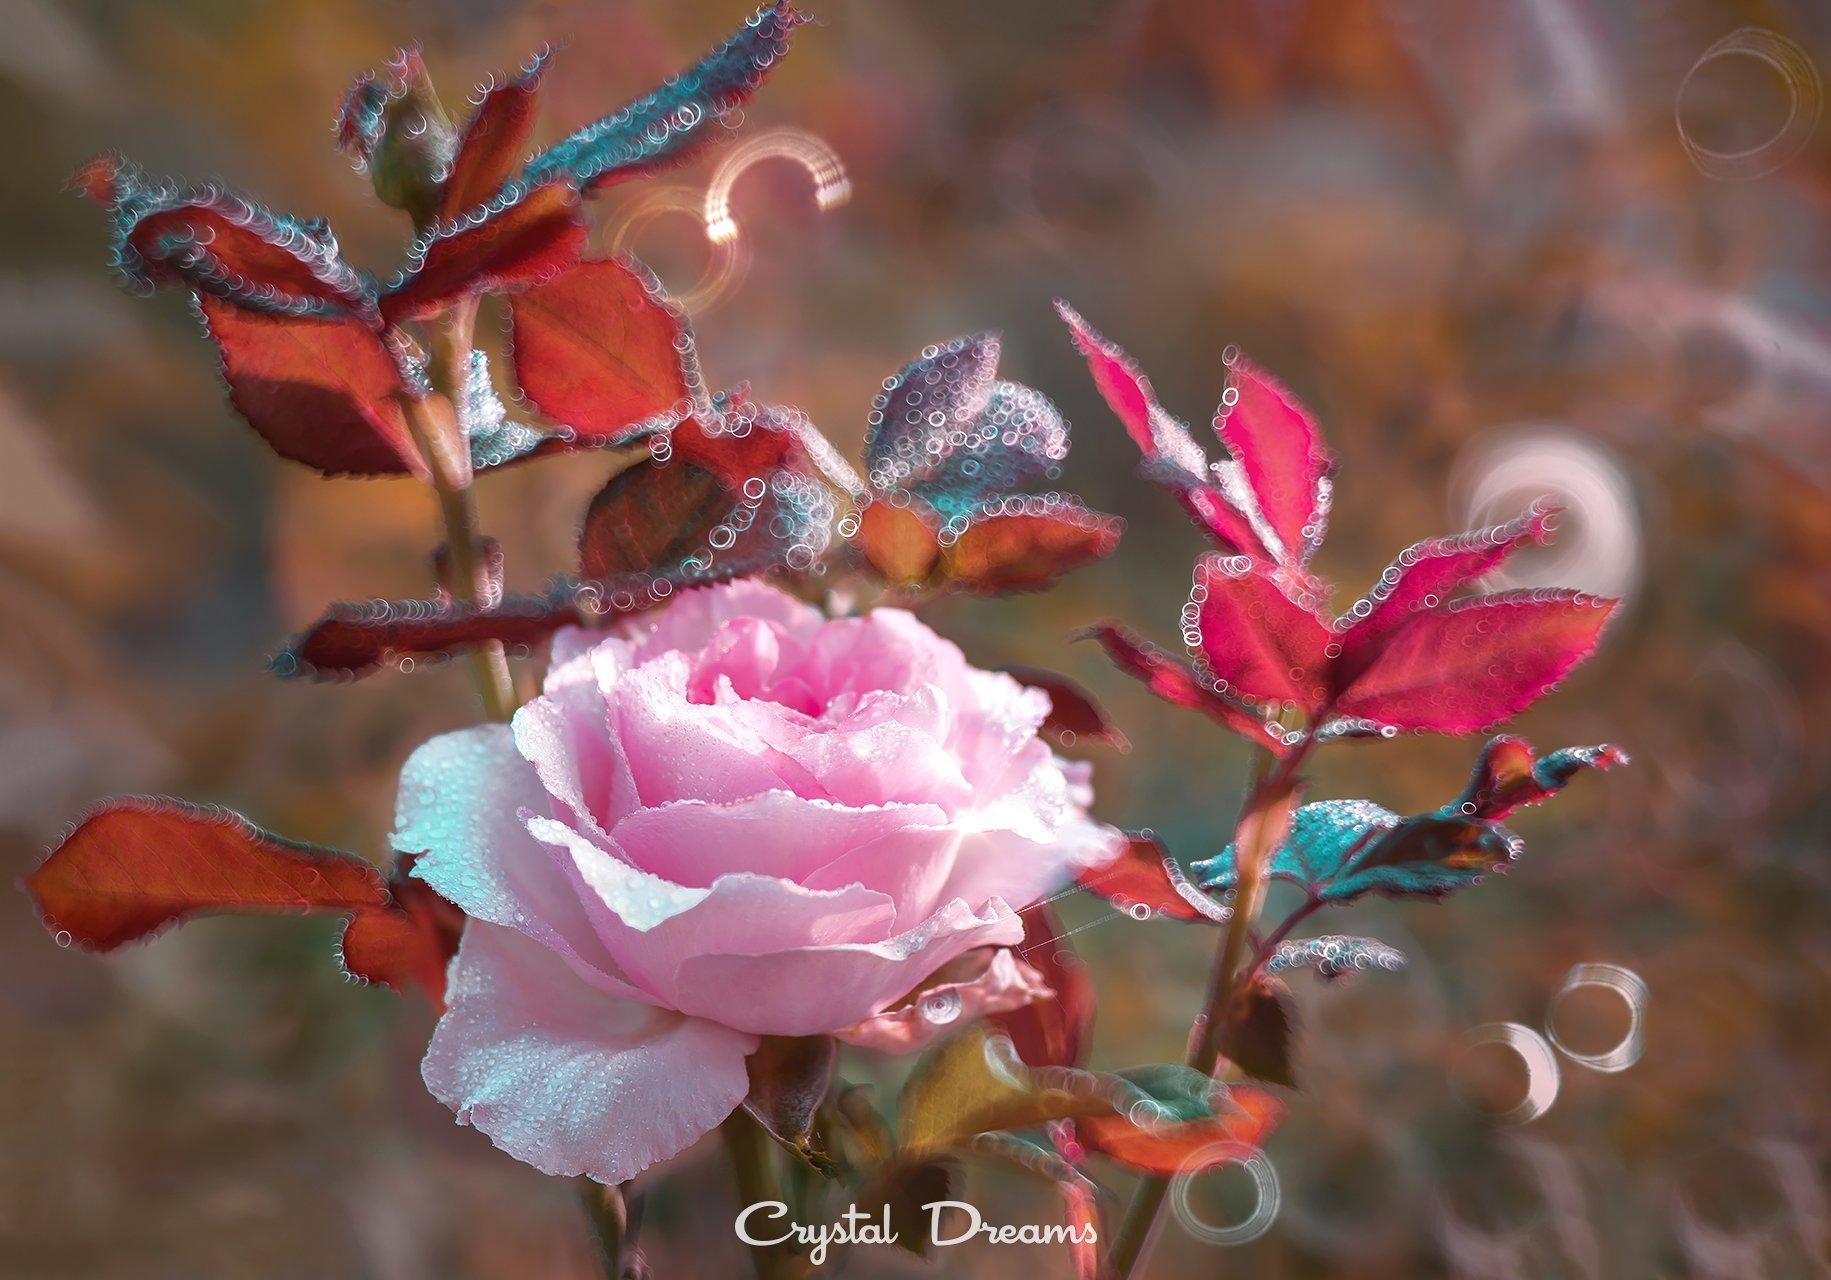 crystal dreams, macro, summer, color, art, nature, flowers, Крылова Татьяна